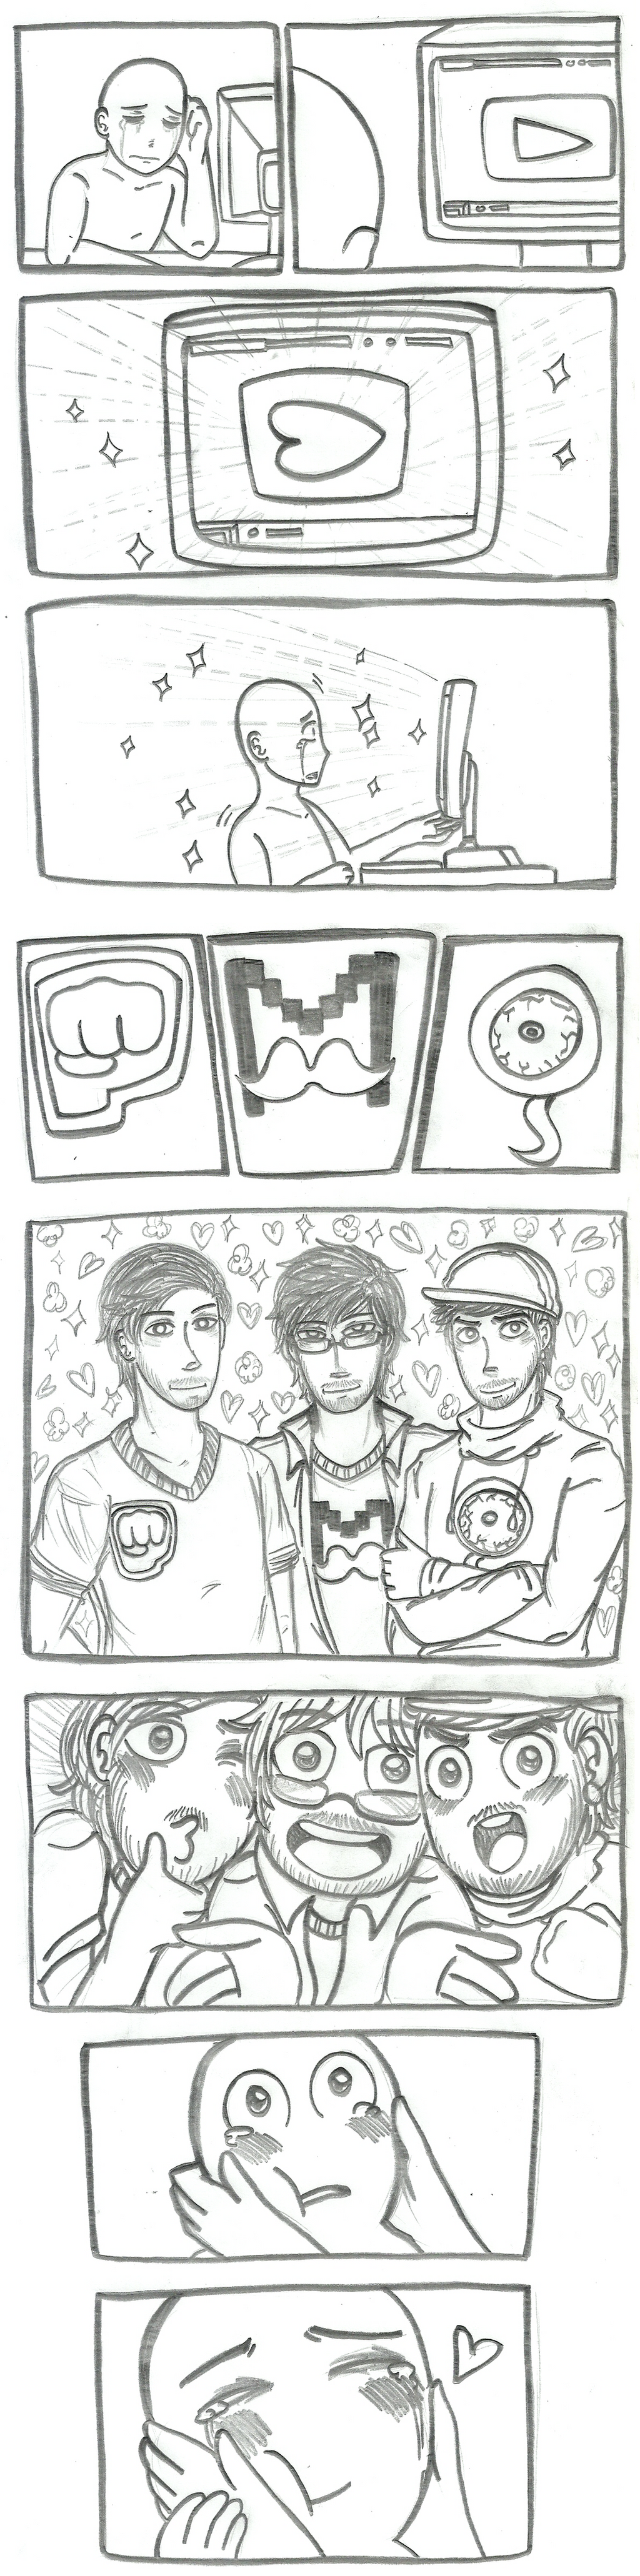 Heroes by Azuneechan